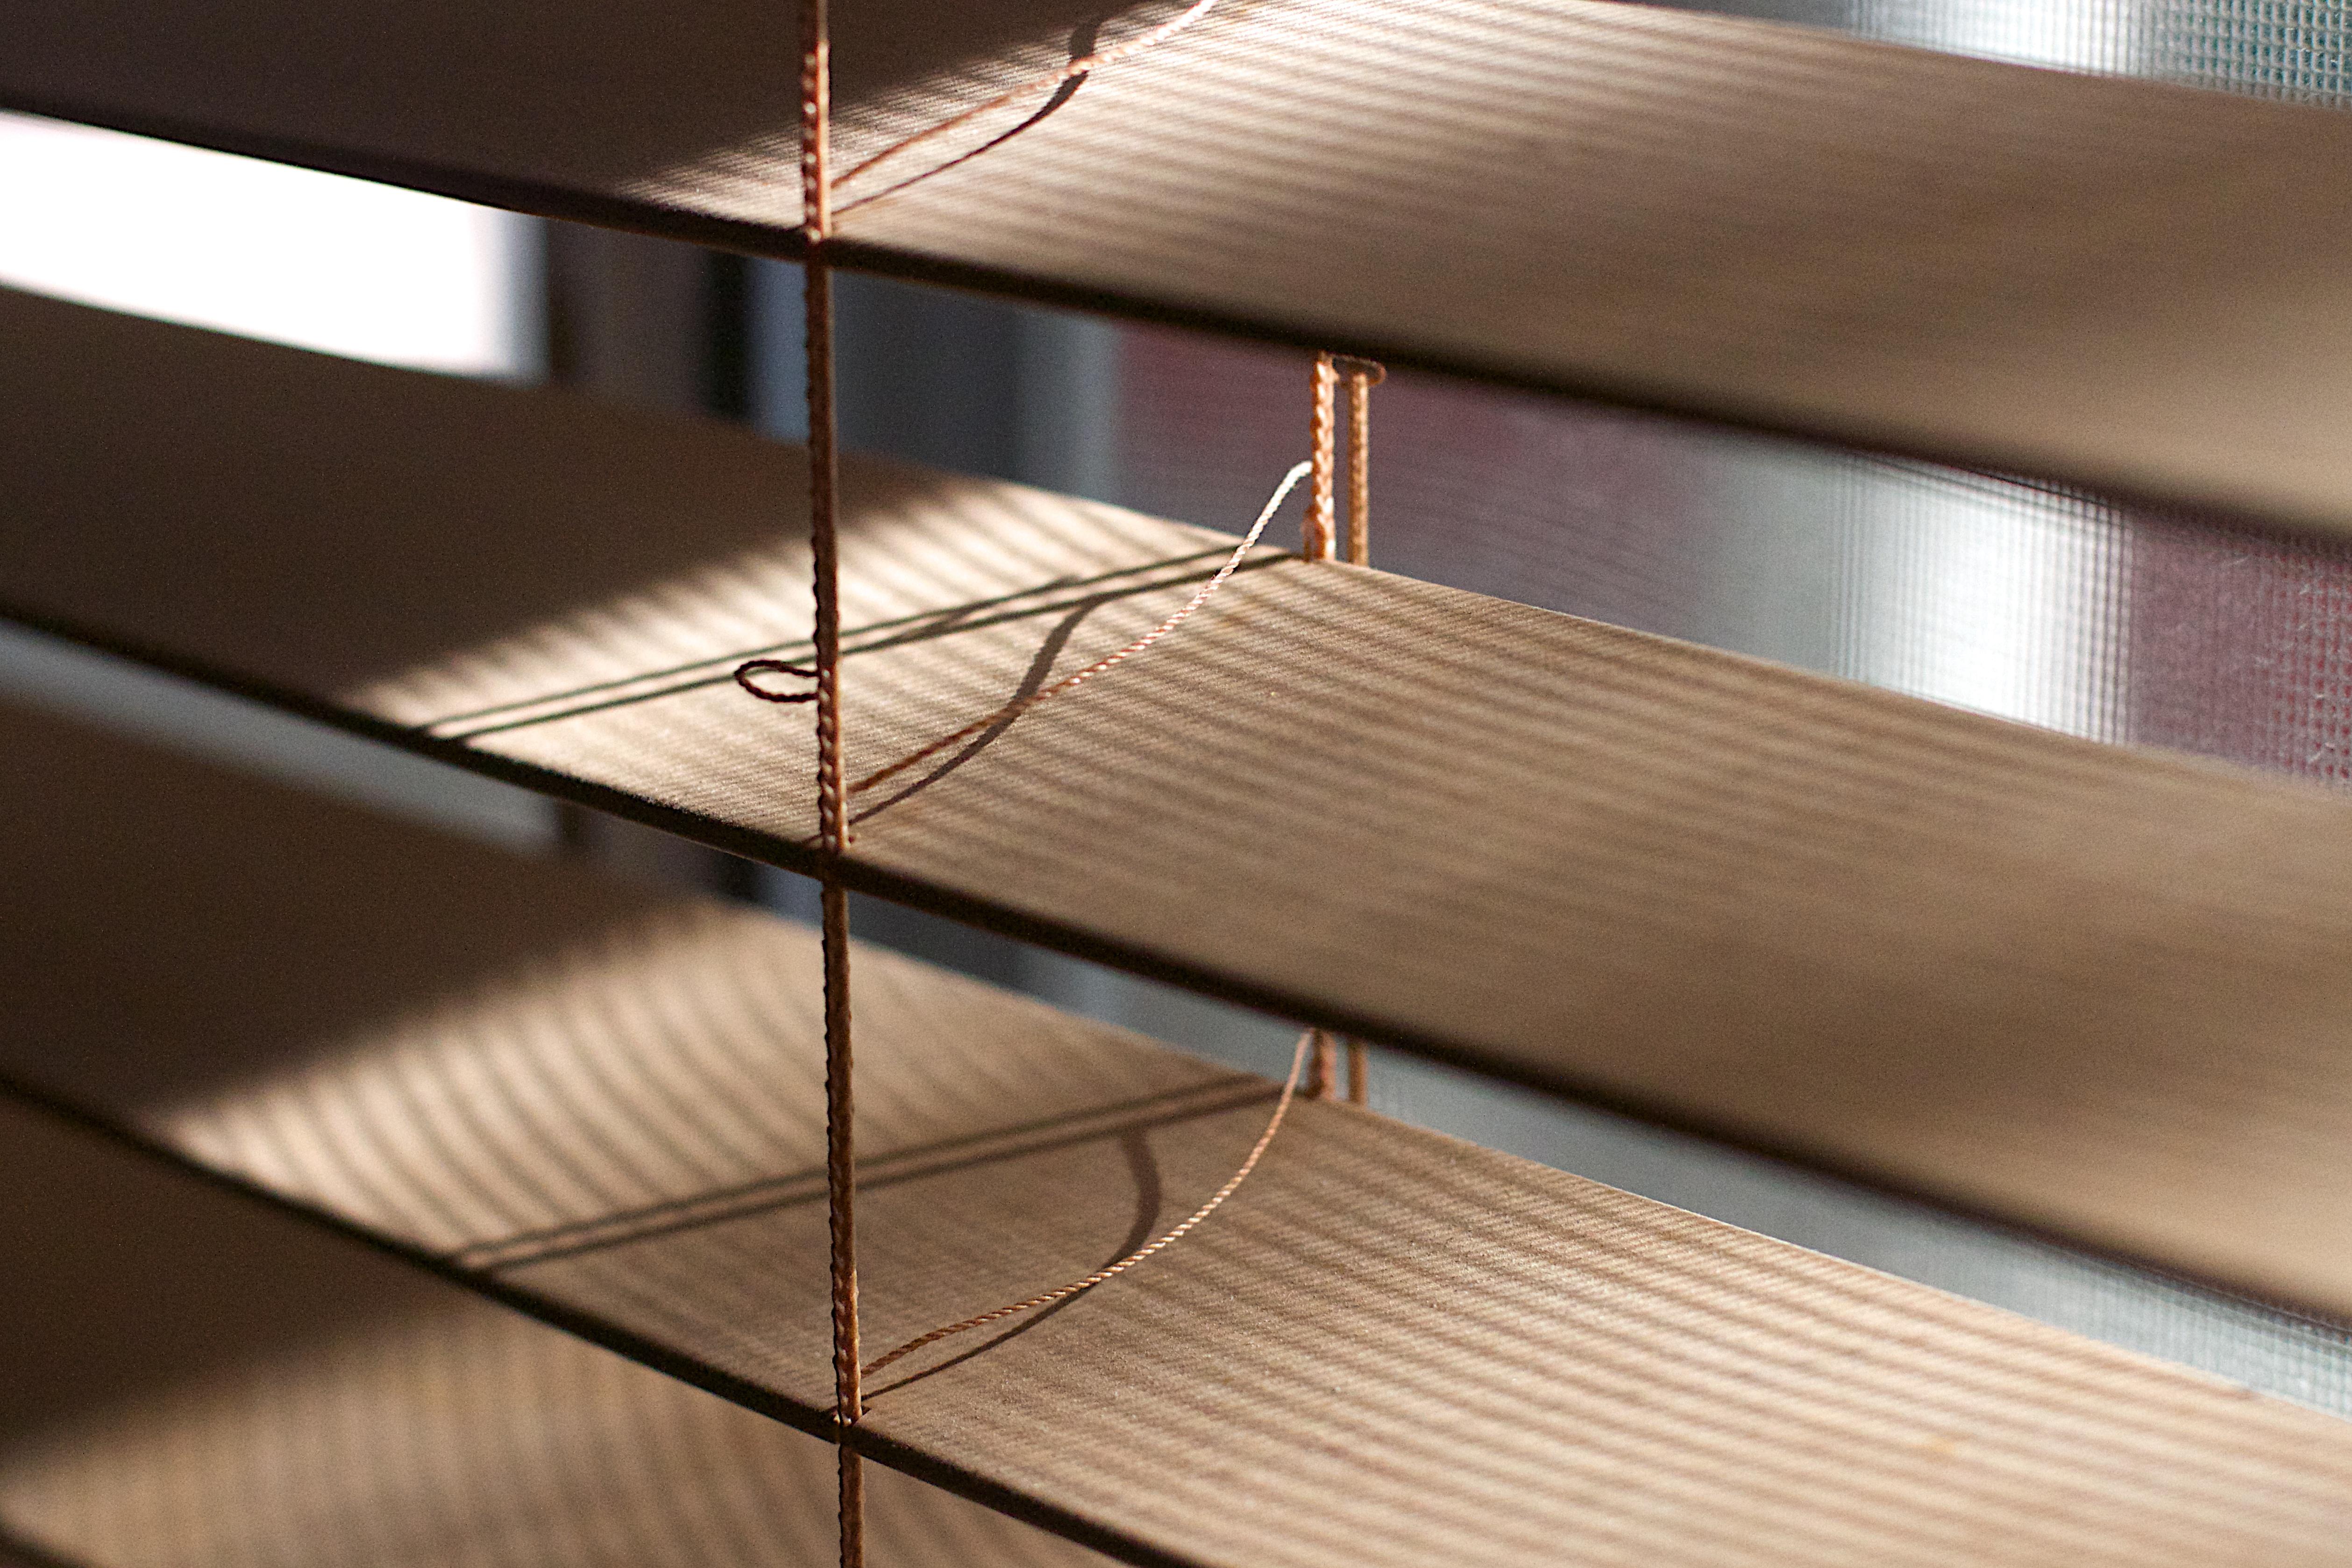 mesa madera piso techo mueble iluminacin diseo de interiores pretil diseo escalera persiana de la ventana